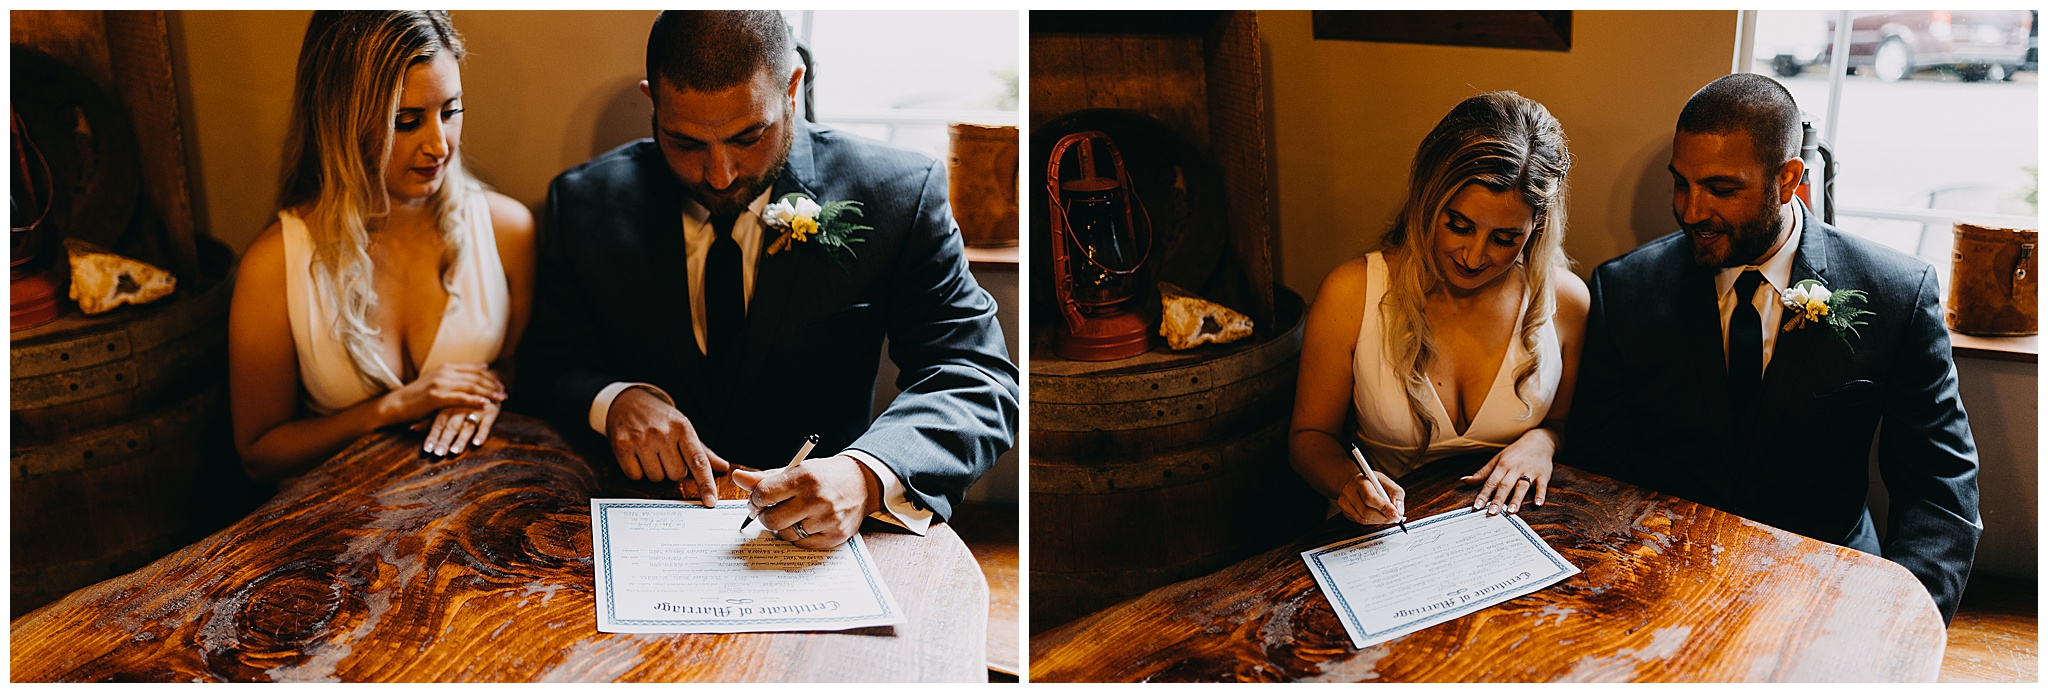 index-wa-wedding54.jpg